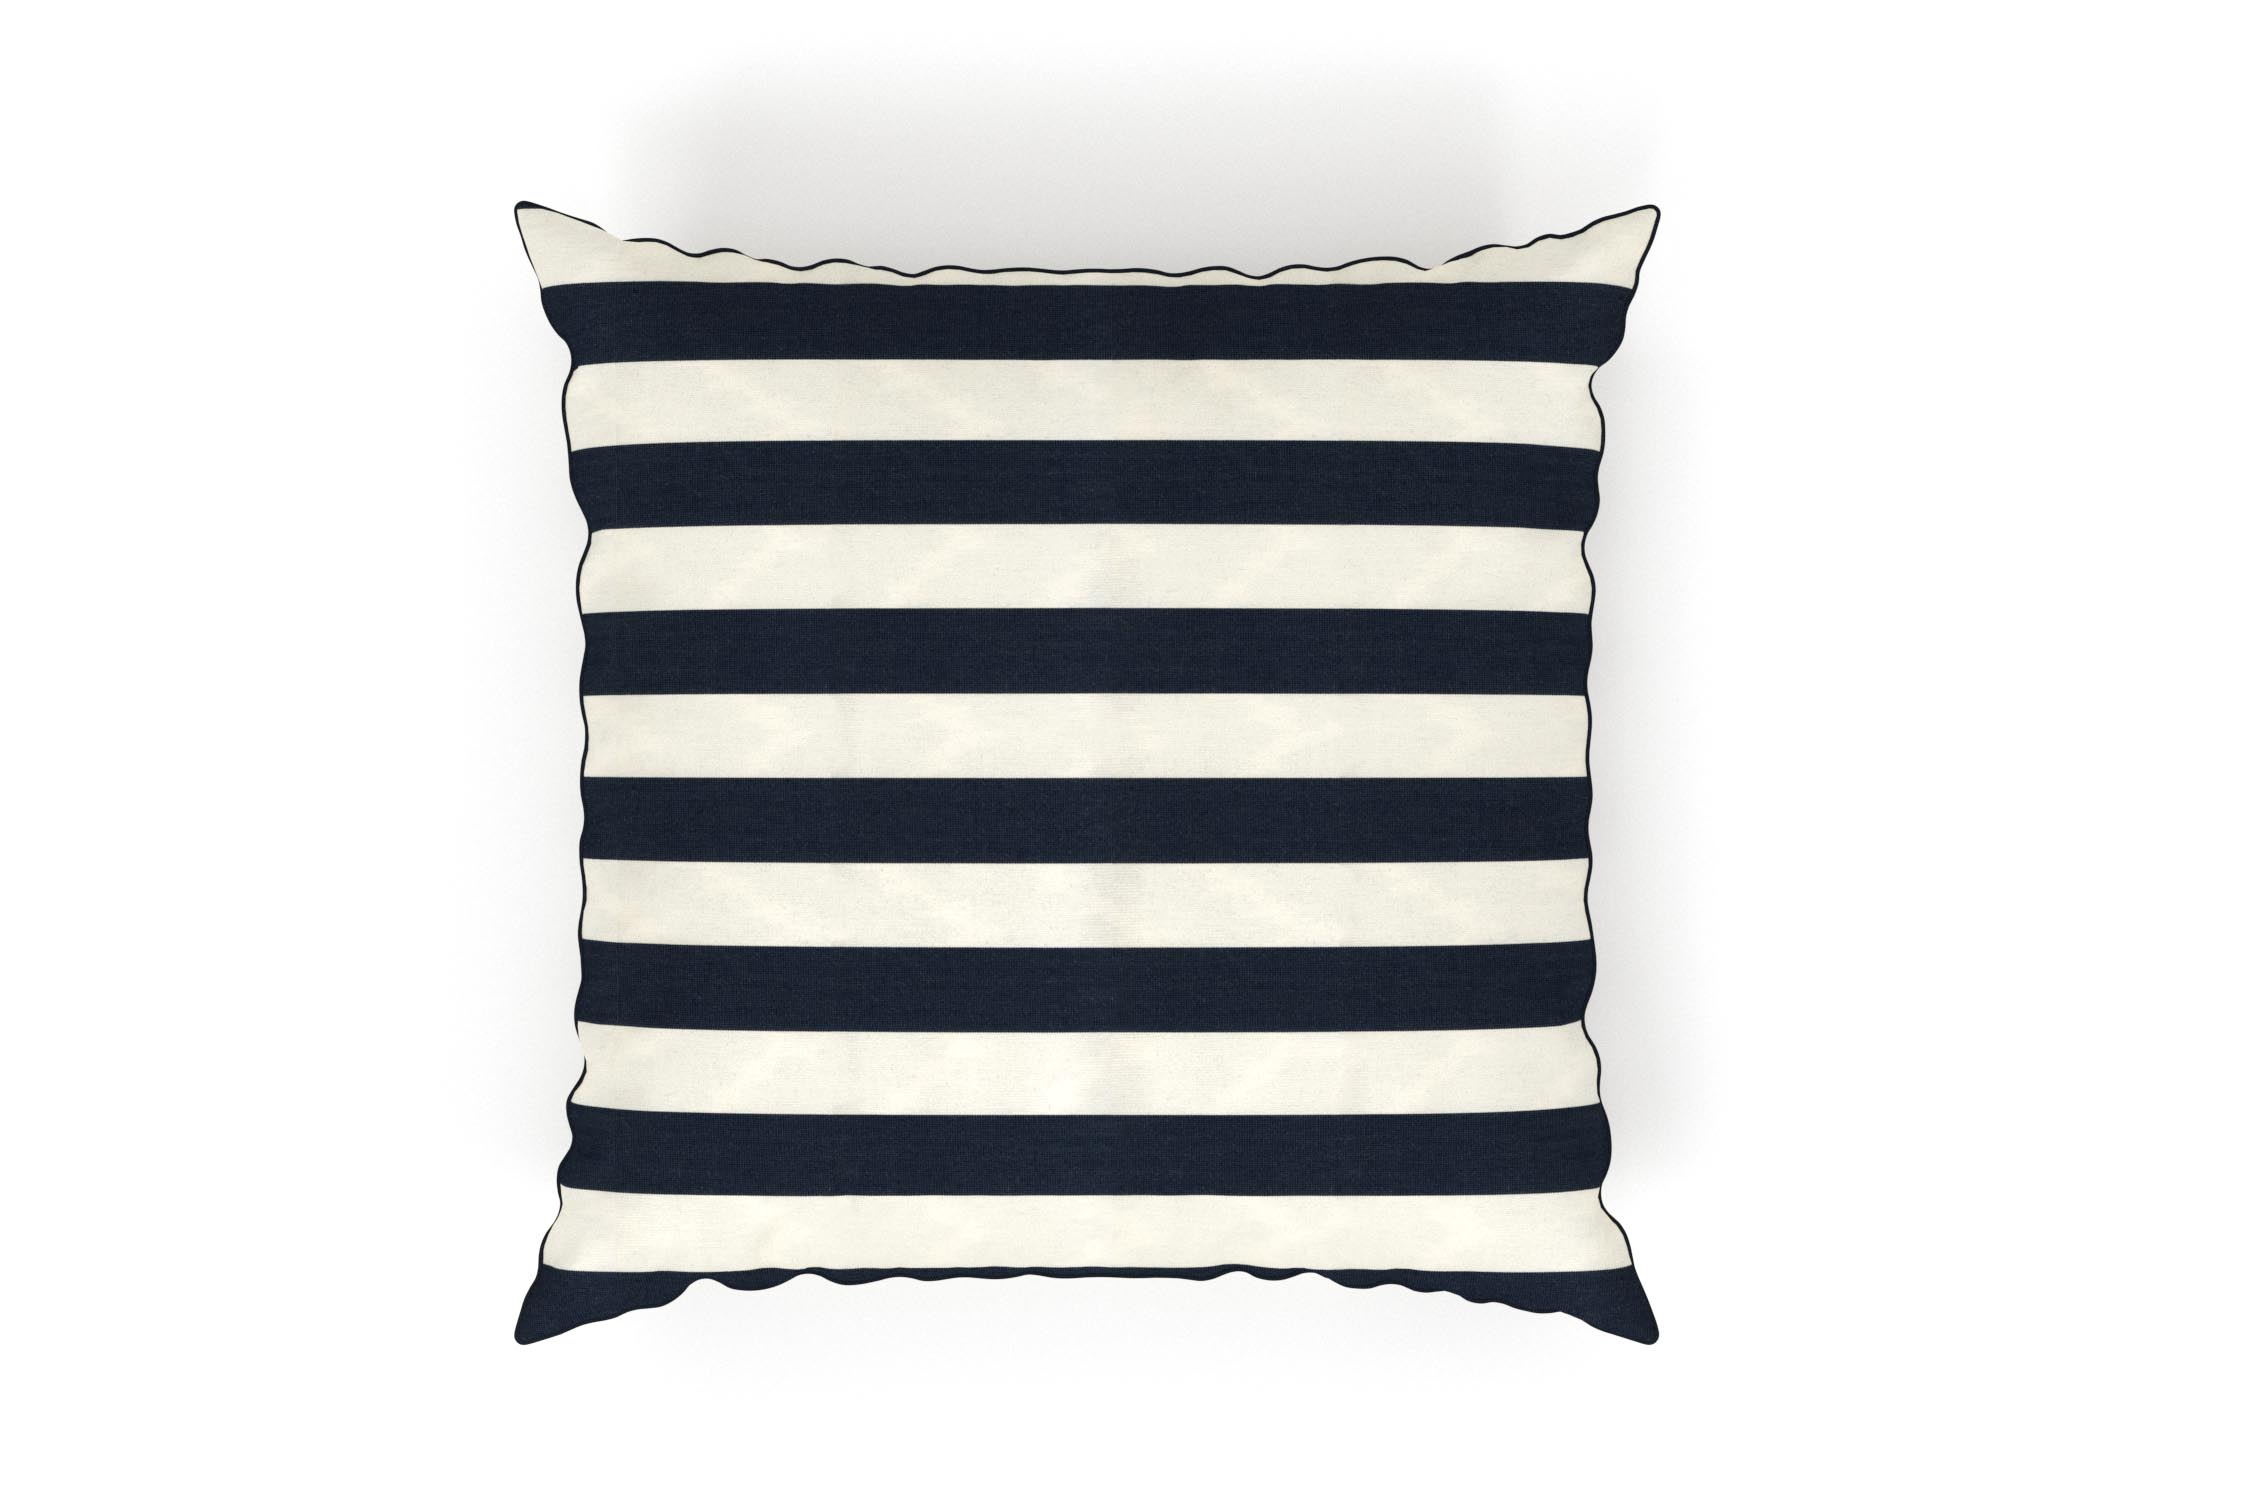 Подушка декоративнаяКвадратные подушки и наволочки<br><br><br>Material: Текстиль<br>Ширина см: 45.0<br>Глубина см: 45.0